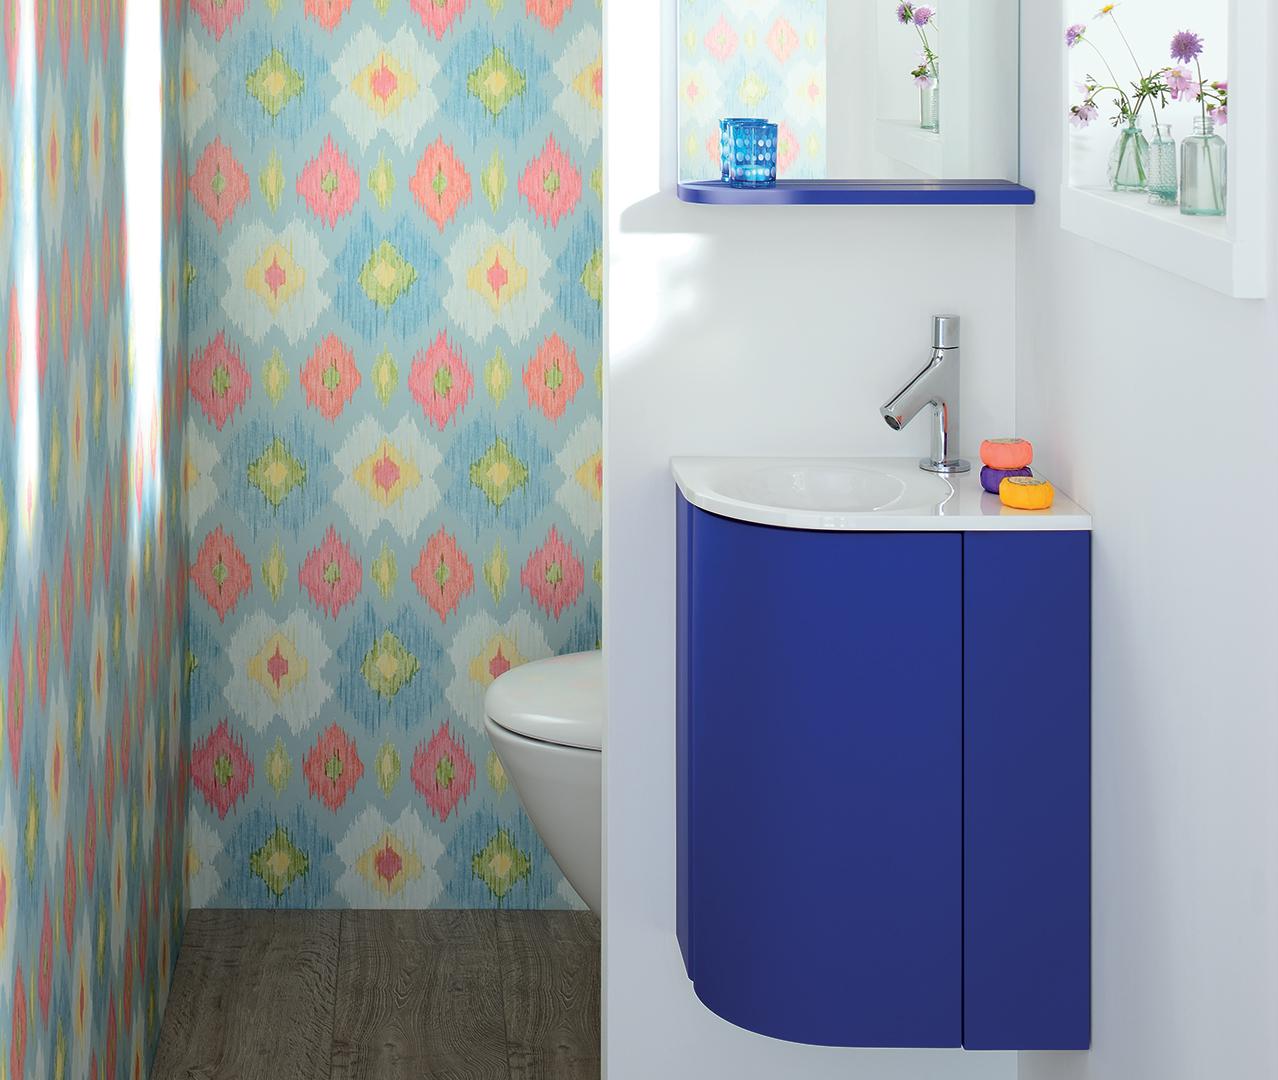 Gamme pop petit meuble de salle de bain sanijura for Salle de bain pop